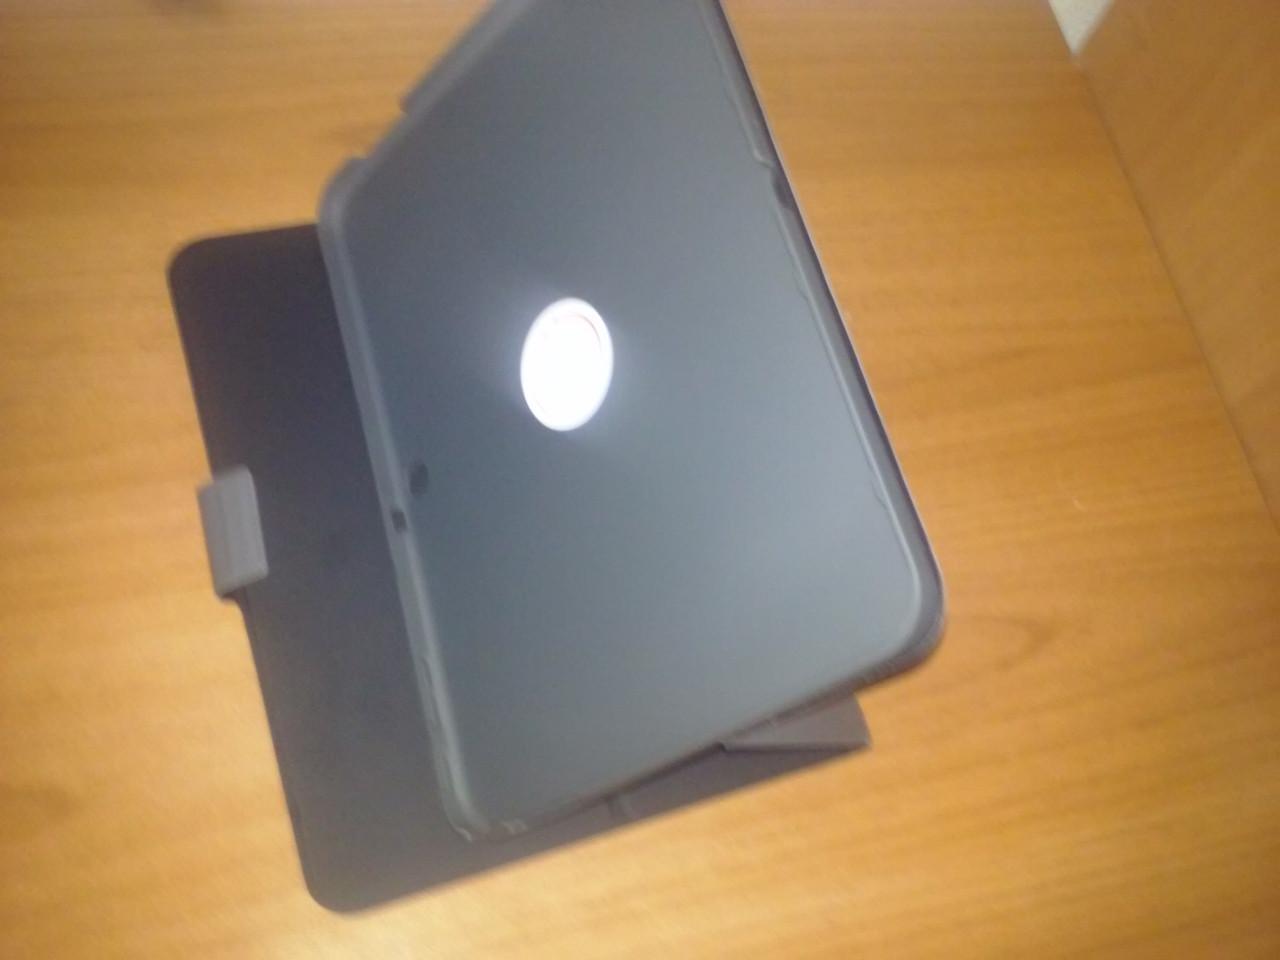 Чехол книжка Samsung Galaxy Tab 3 10.1 P5200 обложка подставка 360 градусов